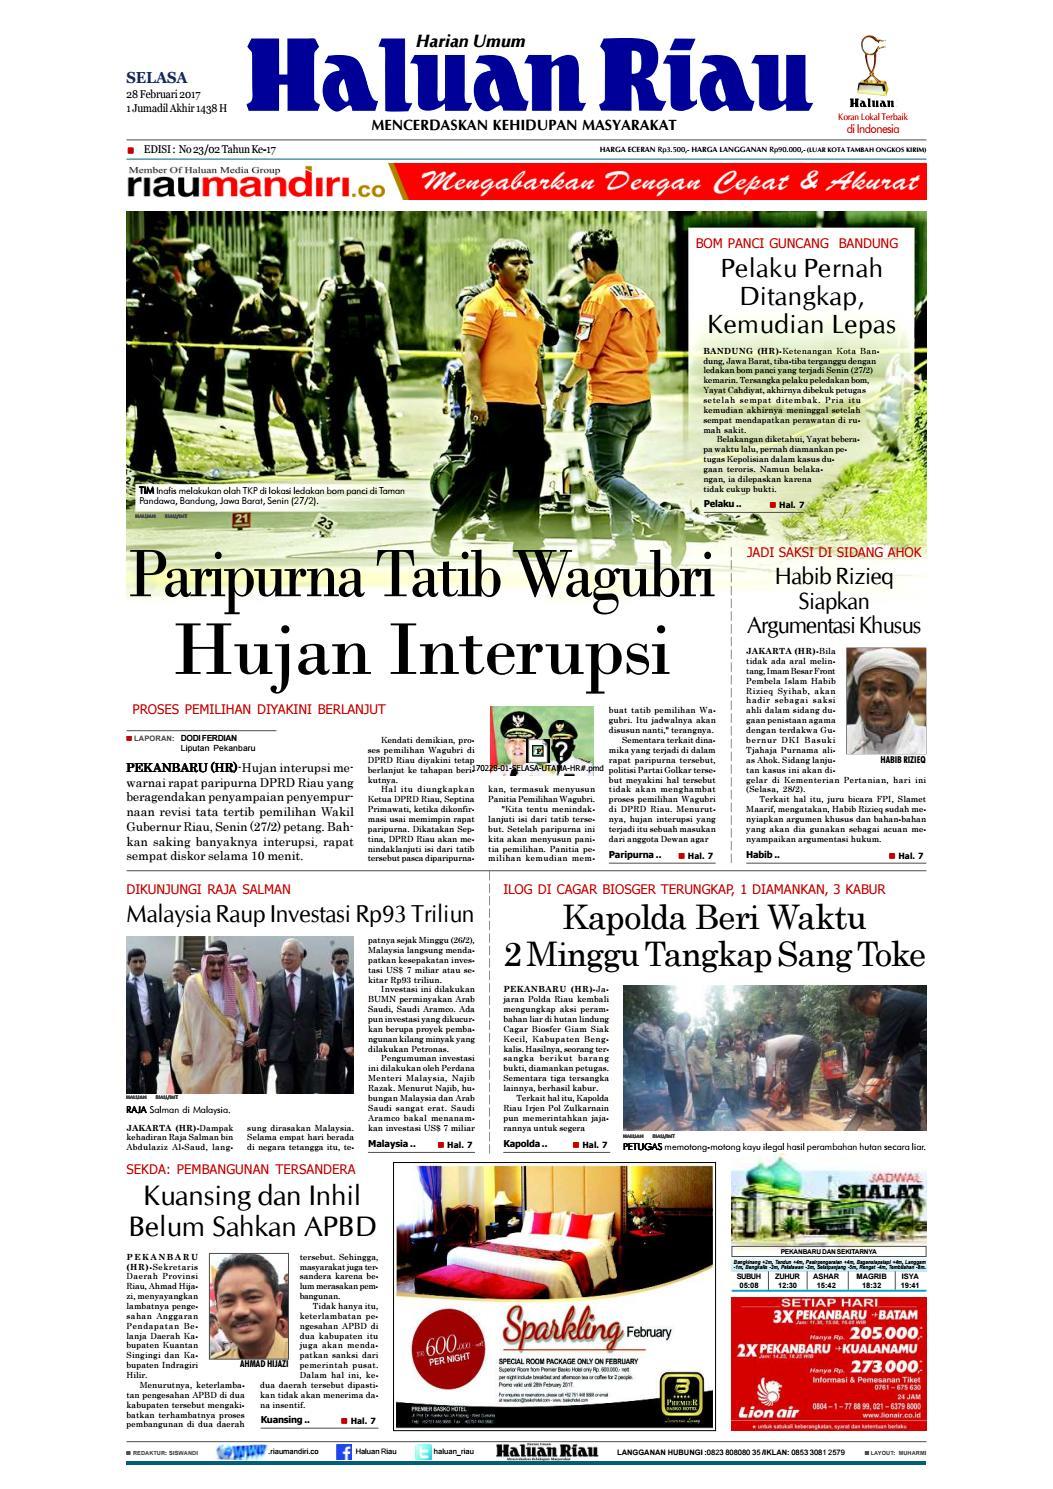 Haluanriau 2017 02 28 By Haluan Riau Issuu Produk Ukm Bumn Bale Sehat Teh Rosella Merah 3 Box